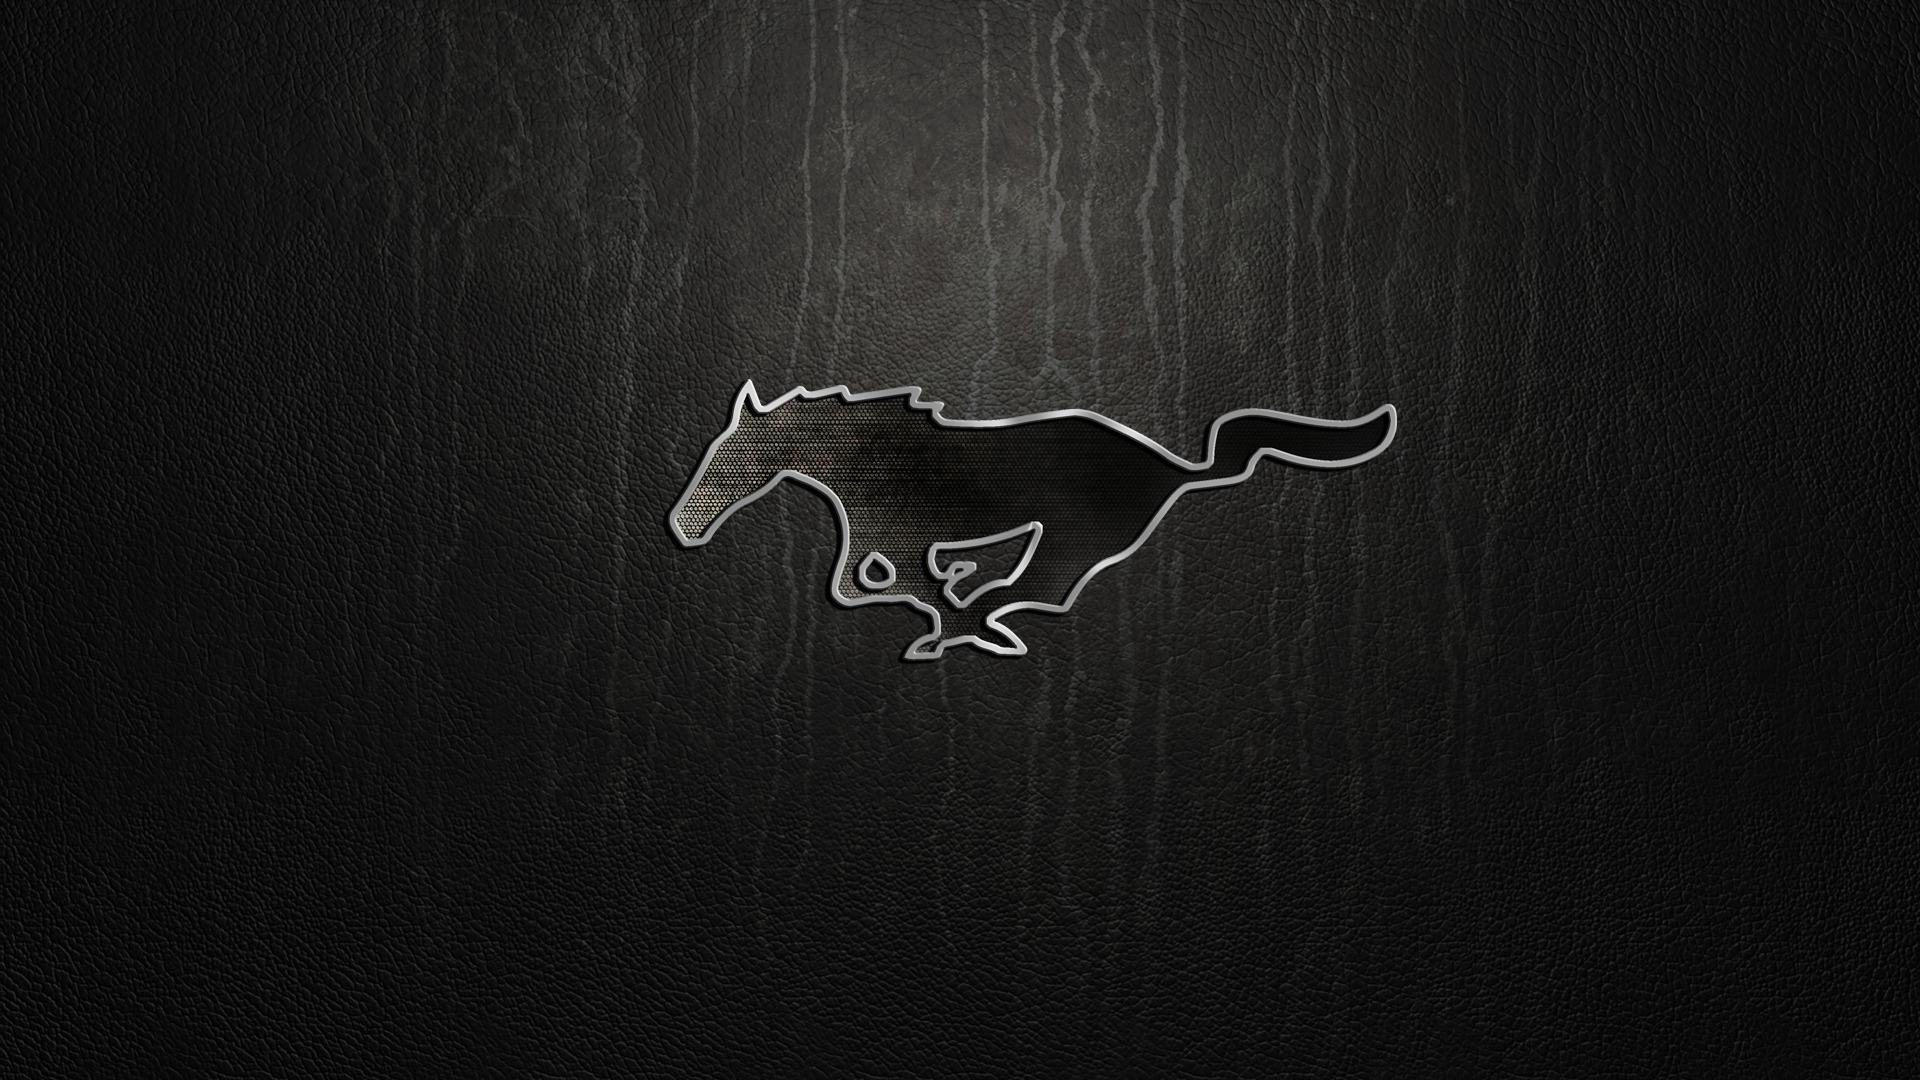 Mustang logo wallpaper for iphone